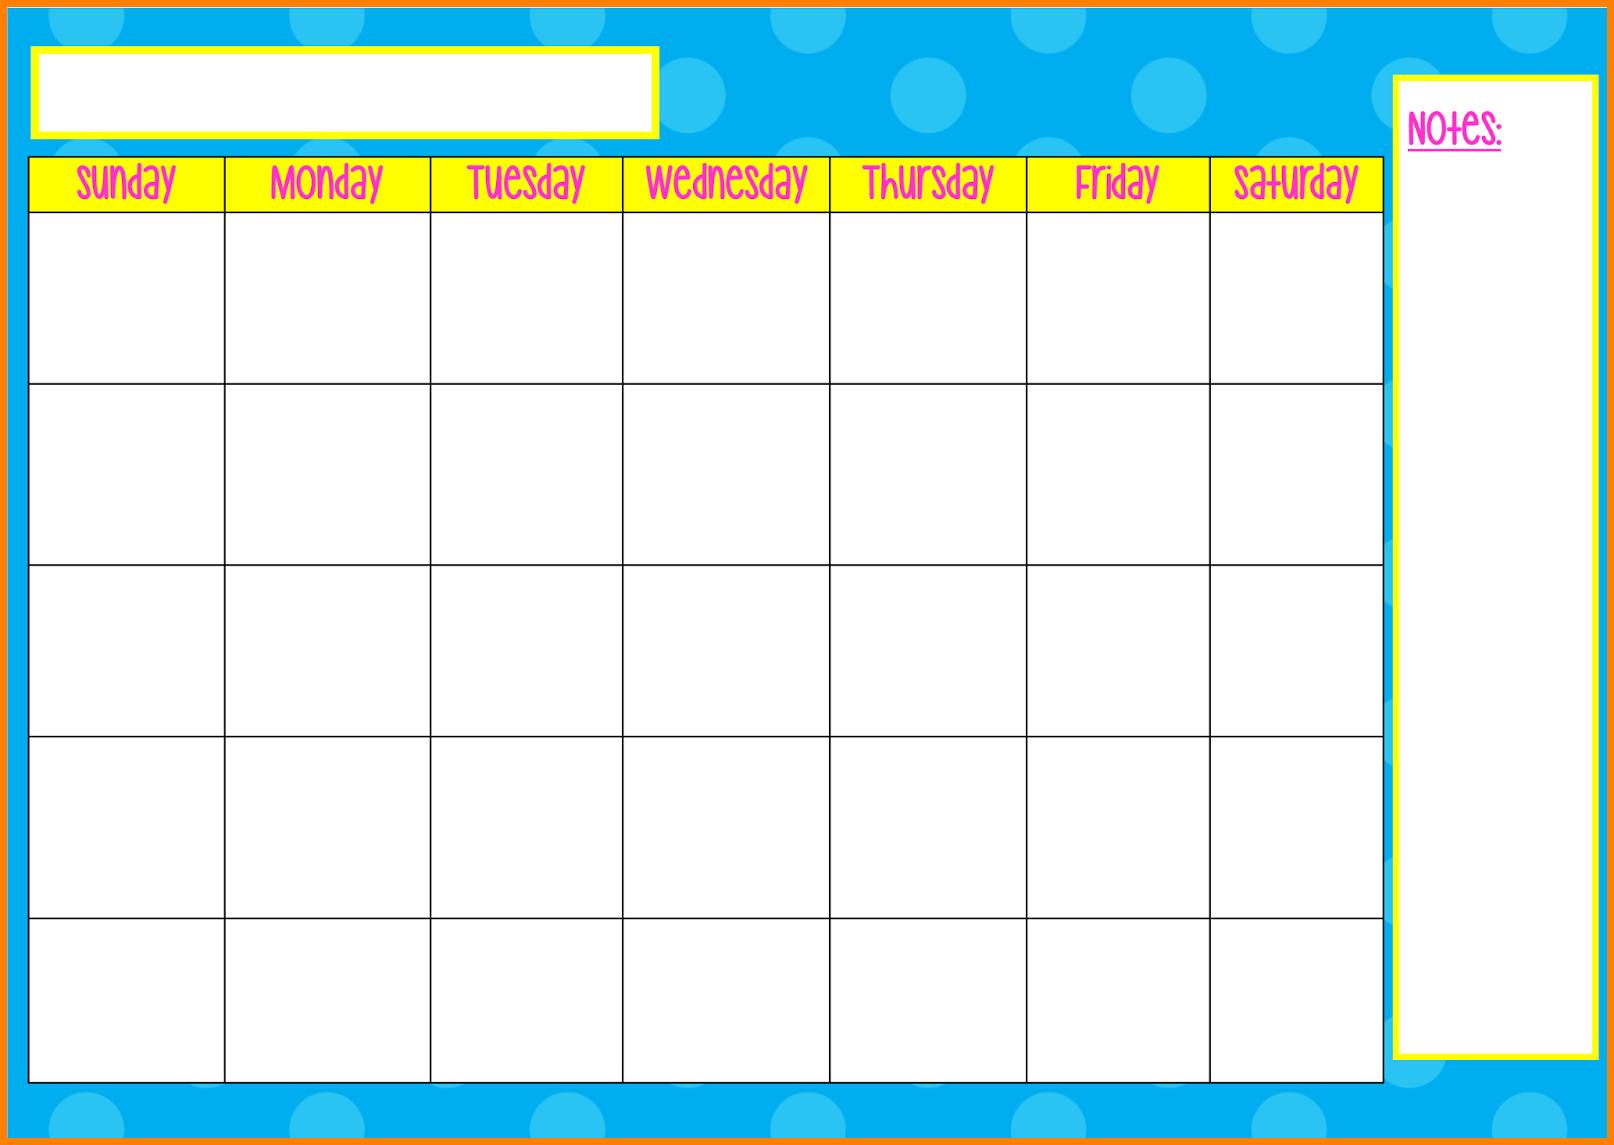 10+ Monday Thru Friday - Card Authorization 2017 Monday To Friday Tempate Printable